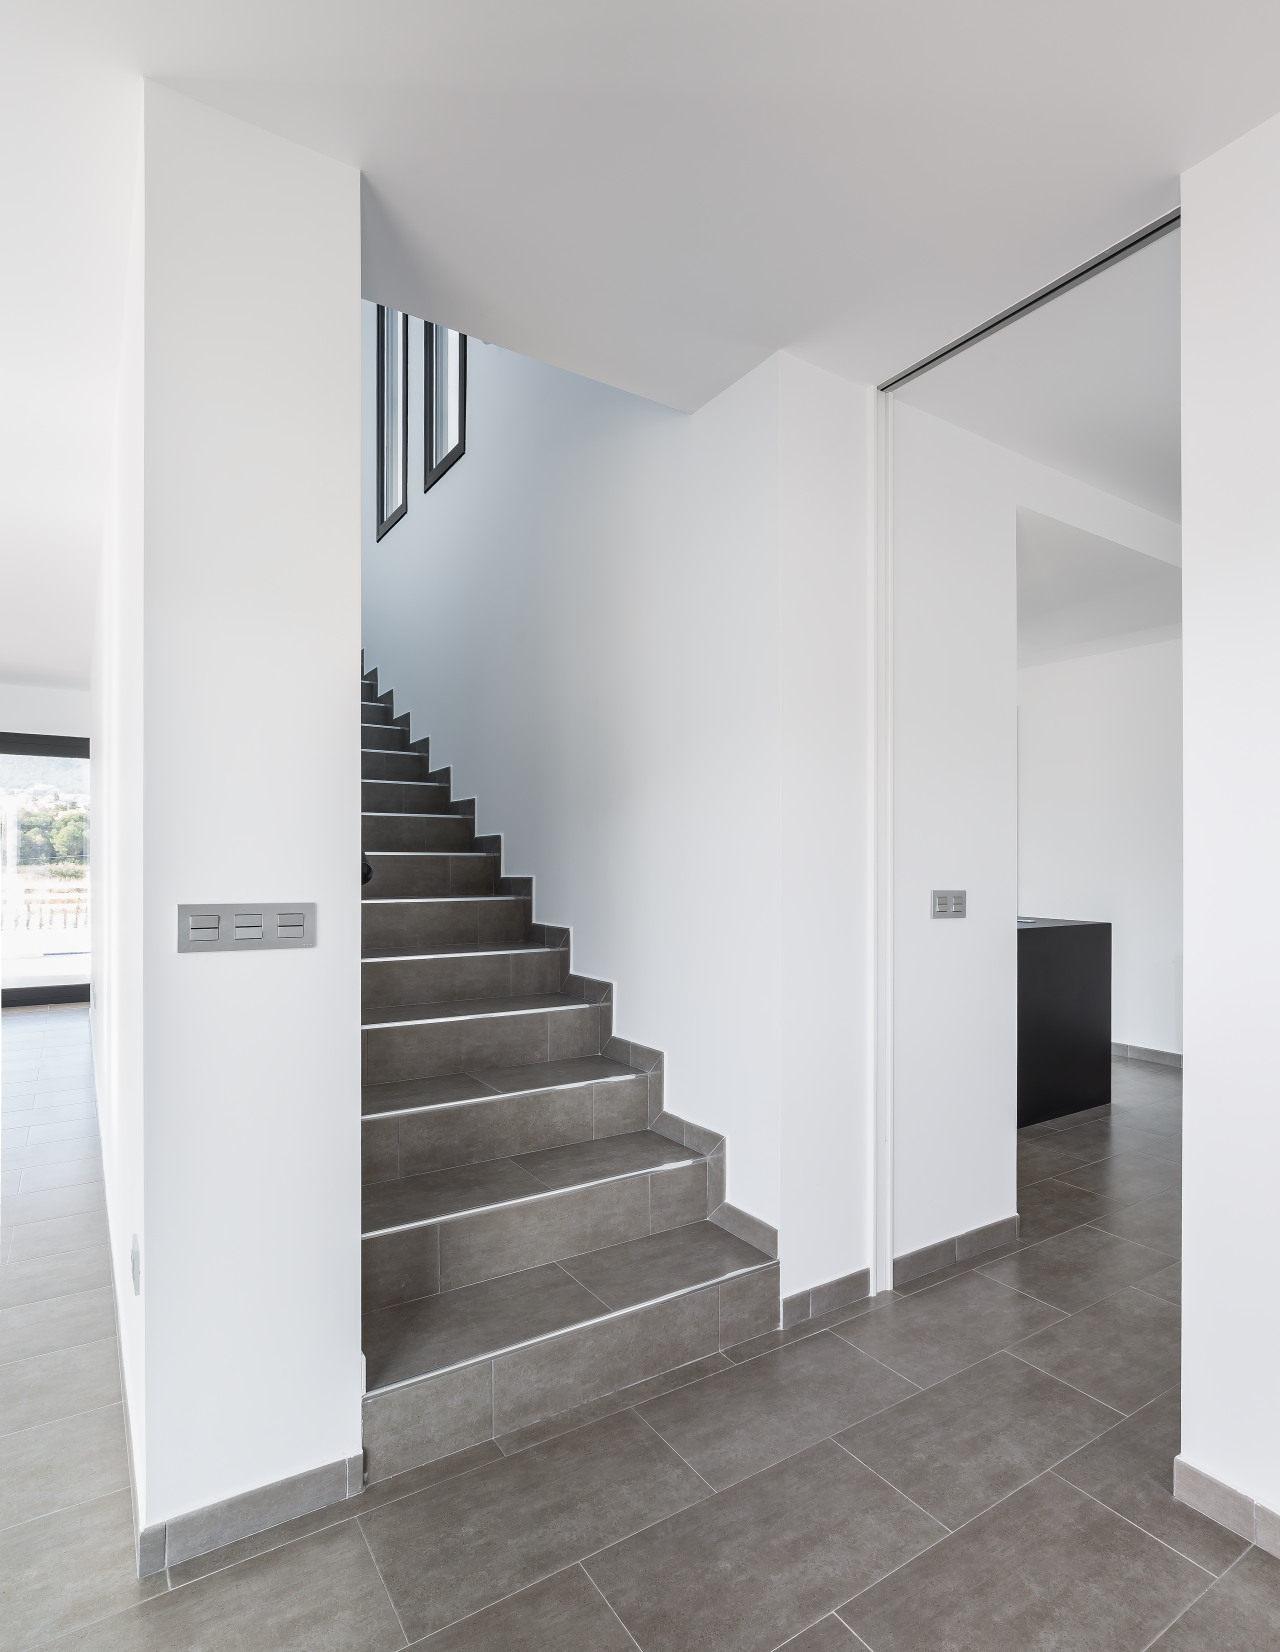 fotografia-arquitectura-valencia-german-cabo-viraje-vivienda-unifamiliar-calpe (34)